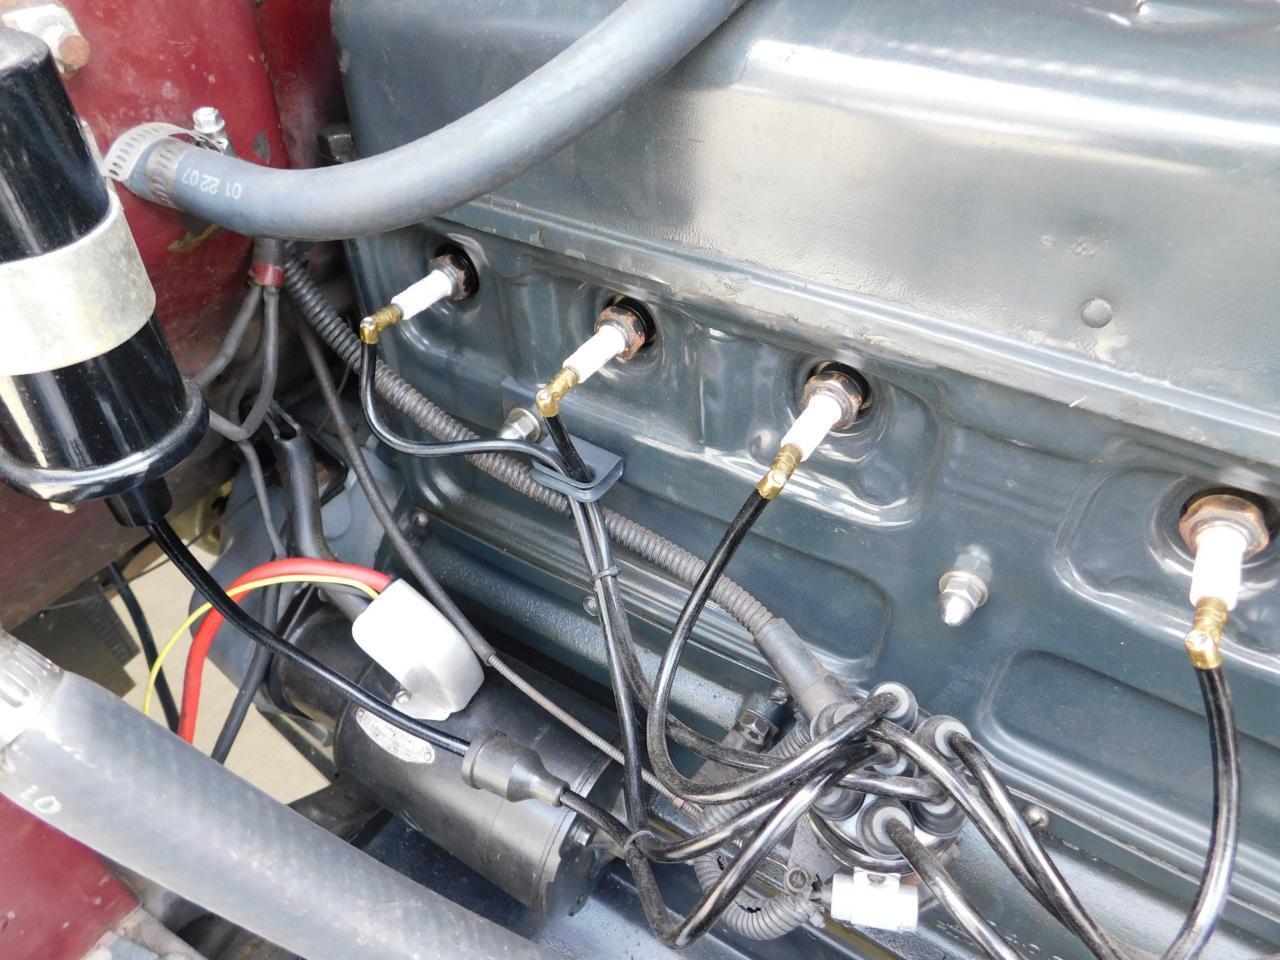 1931 Chevy Electrical Wiring - Data Wiring Diagram Today on 1979 chevrolet wiring diagram, 1967 chevrolet wiring diagram, 1976 chevrolet wiring diagram, 1940 chevrolet wiring diagram, 1937 chevrolet wiring diagram, 1958 chevrolet wiring diagram, 1955 chevrolet wiring diagram, 1949 chevrolet wiring diagram,